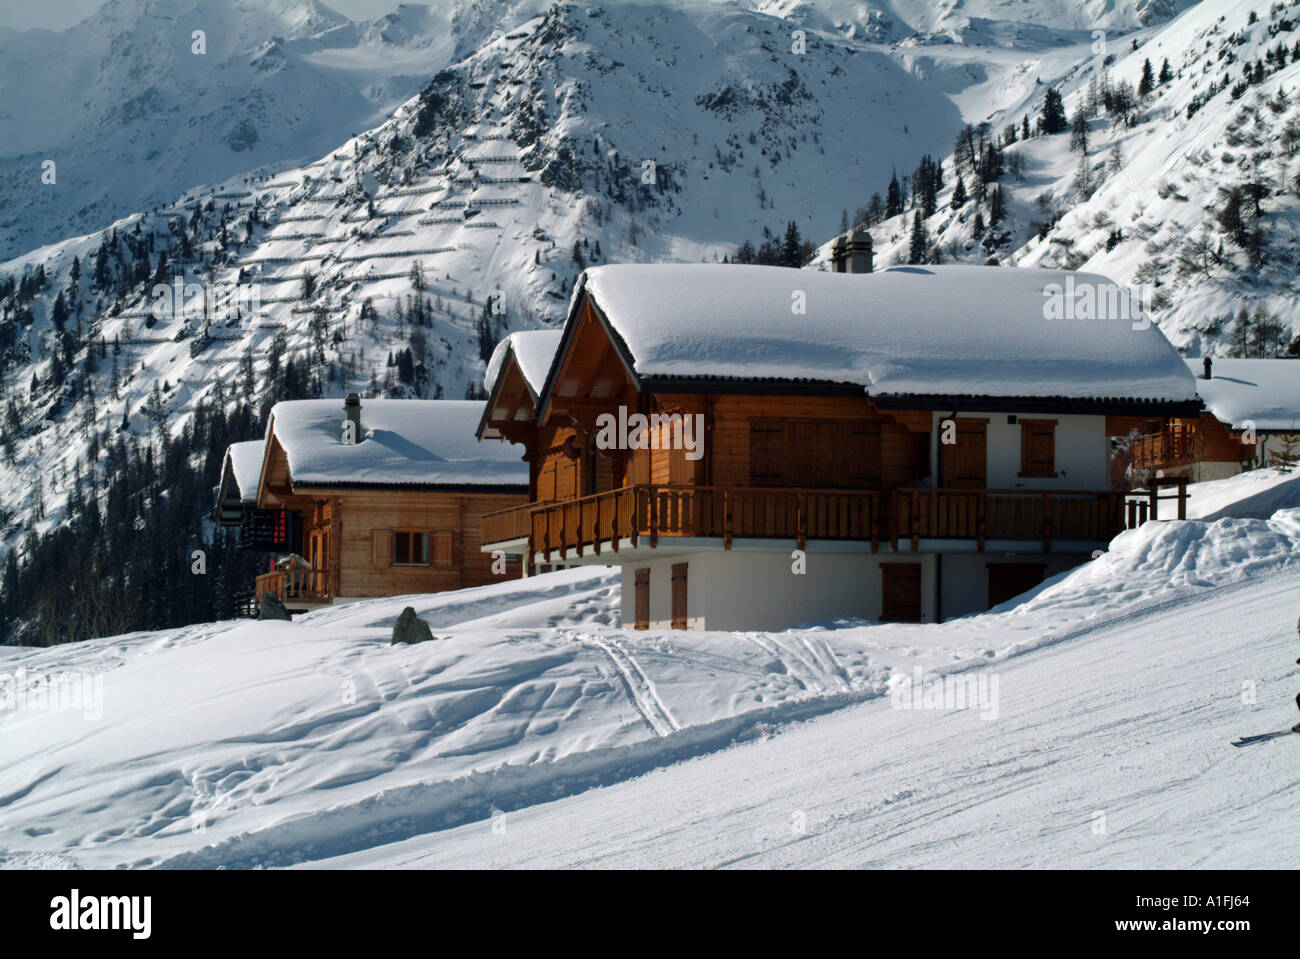 swiss ski chalet les collons verbier switzerland alpine ski resort